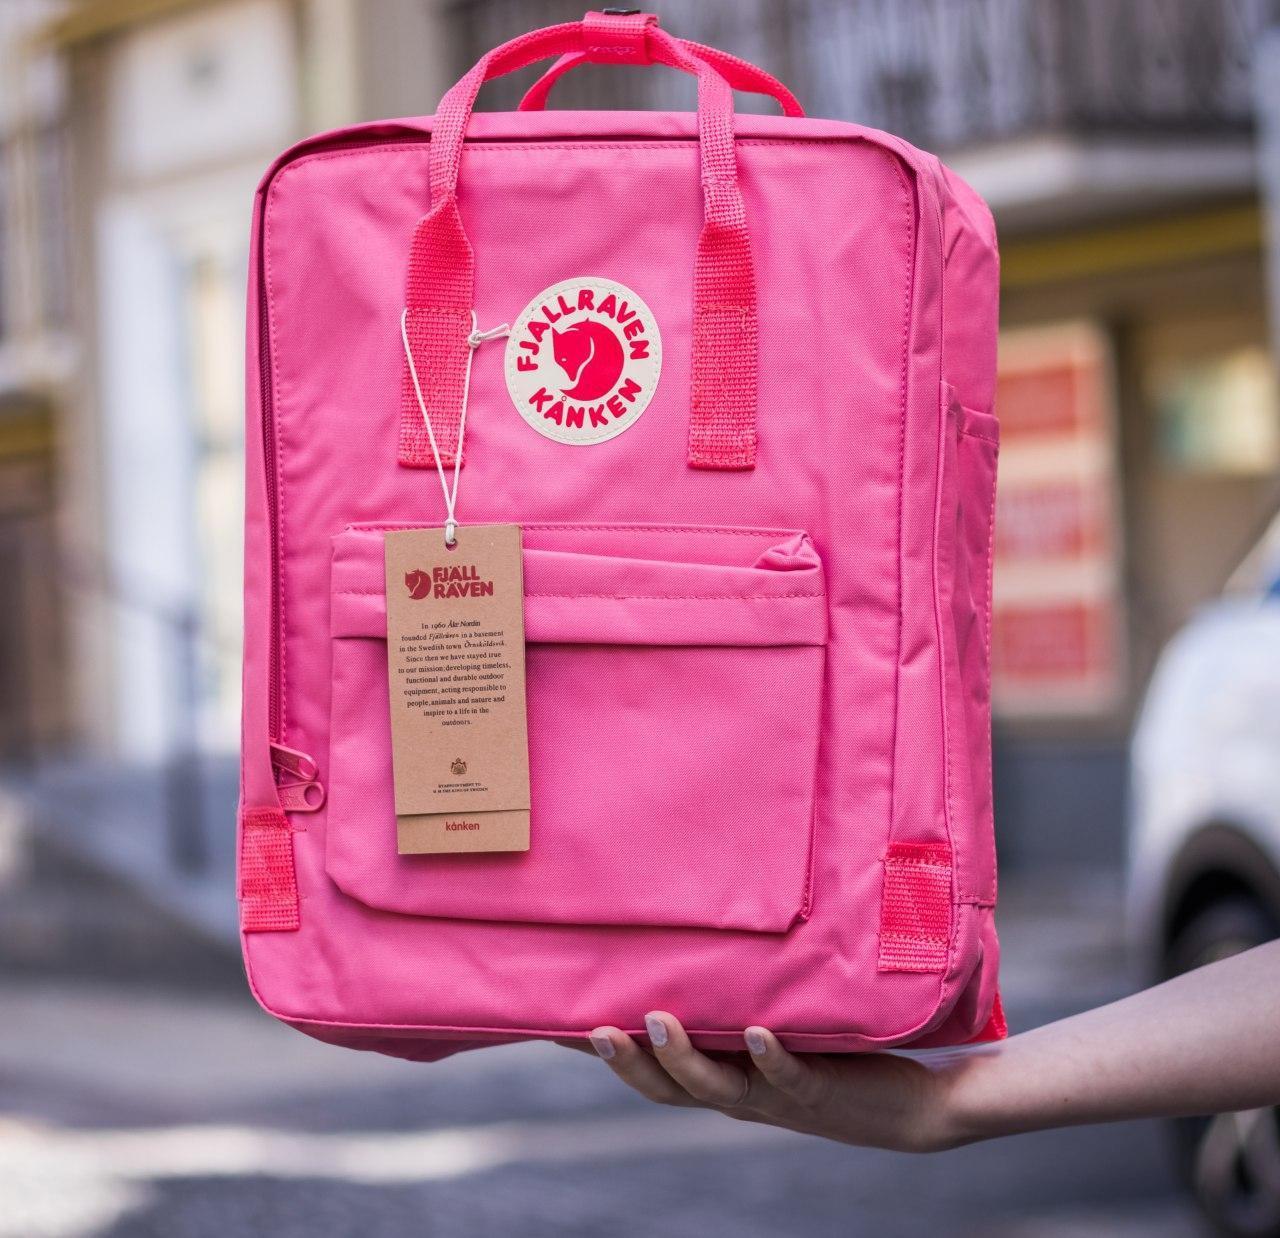 Рюкзак Fjallraven Kanken Classic (Фьялравен Канкен Класик) Pink / Розовый